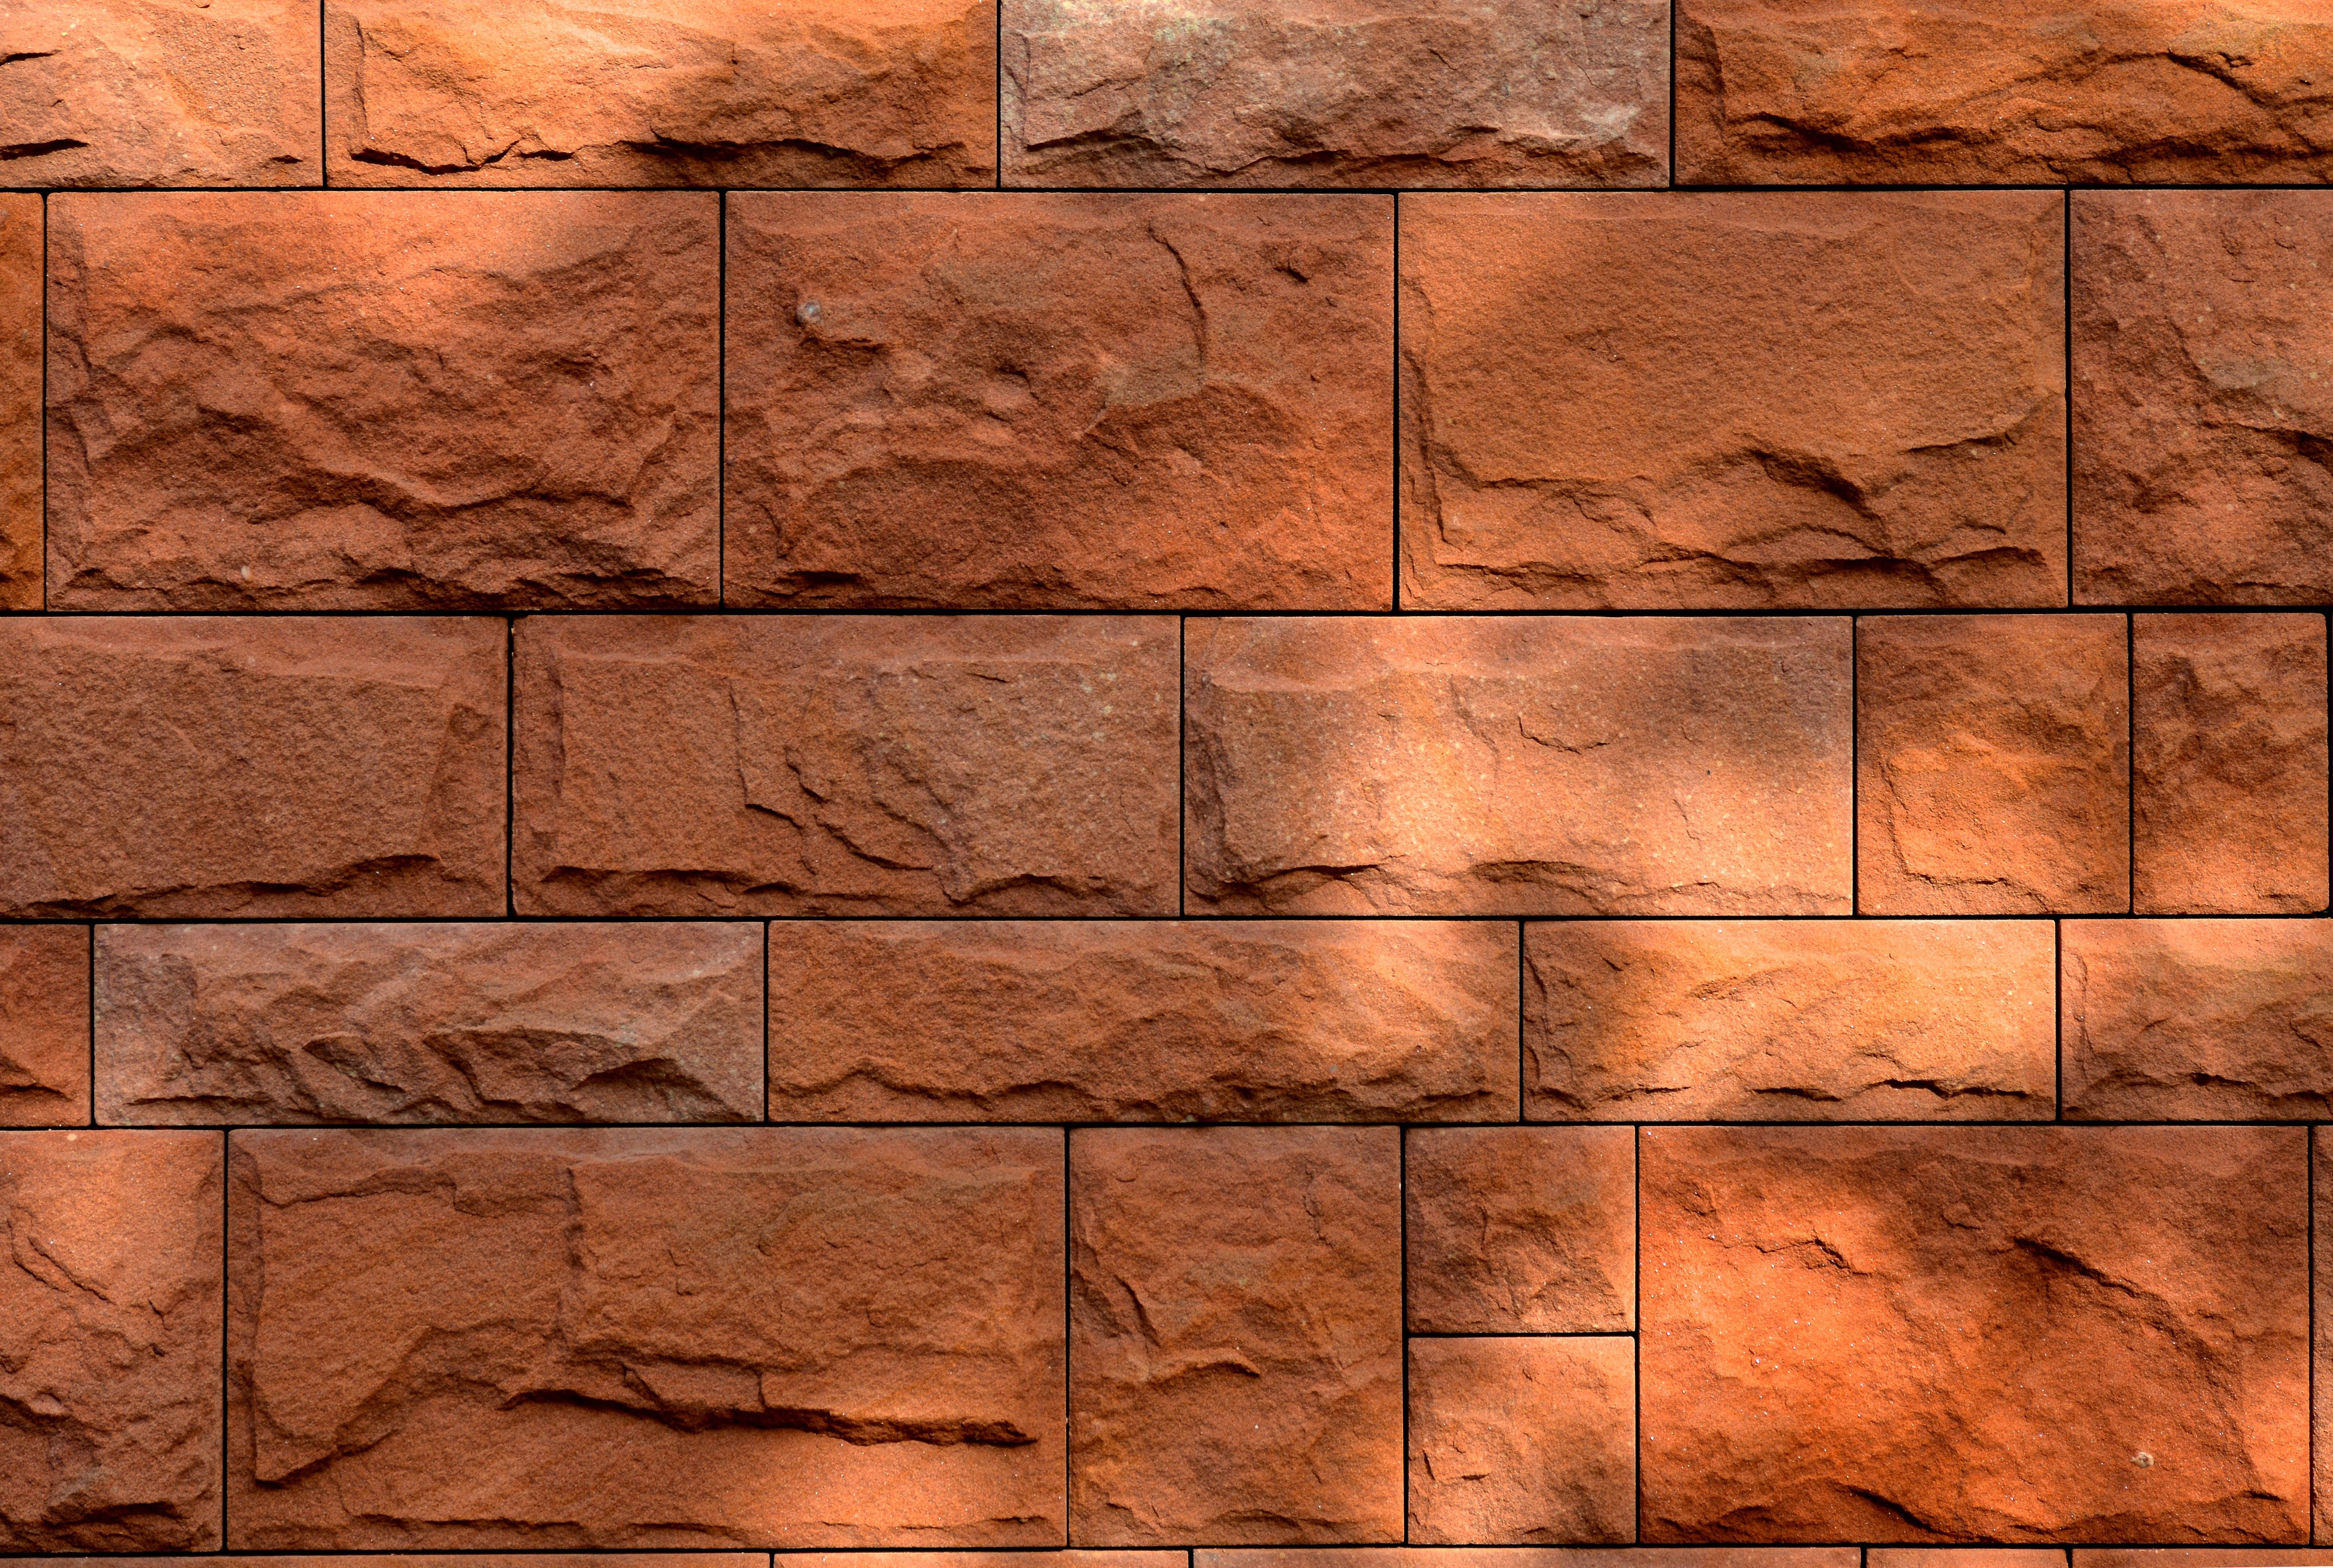 Sand Wood Texture Floor Wall Stone Soil Brick Material Hardwood Brickwork Flooring